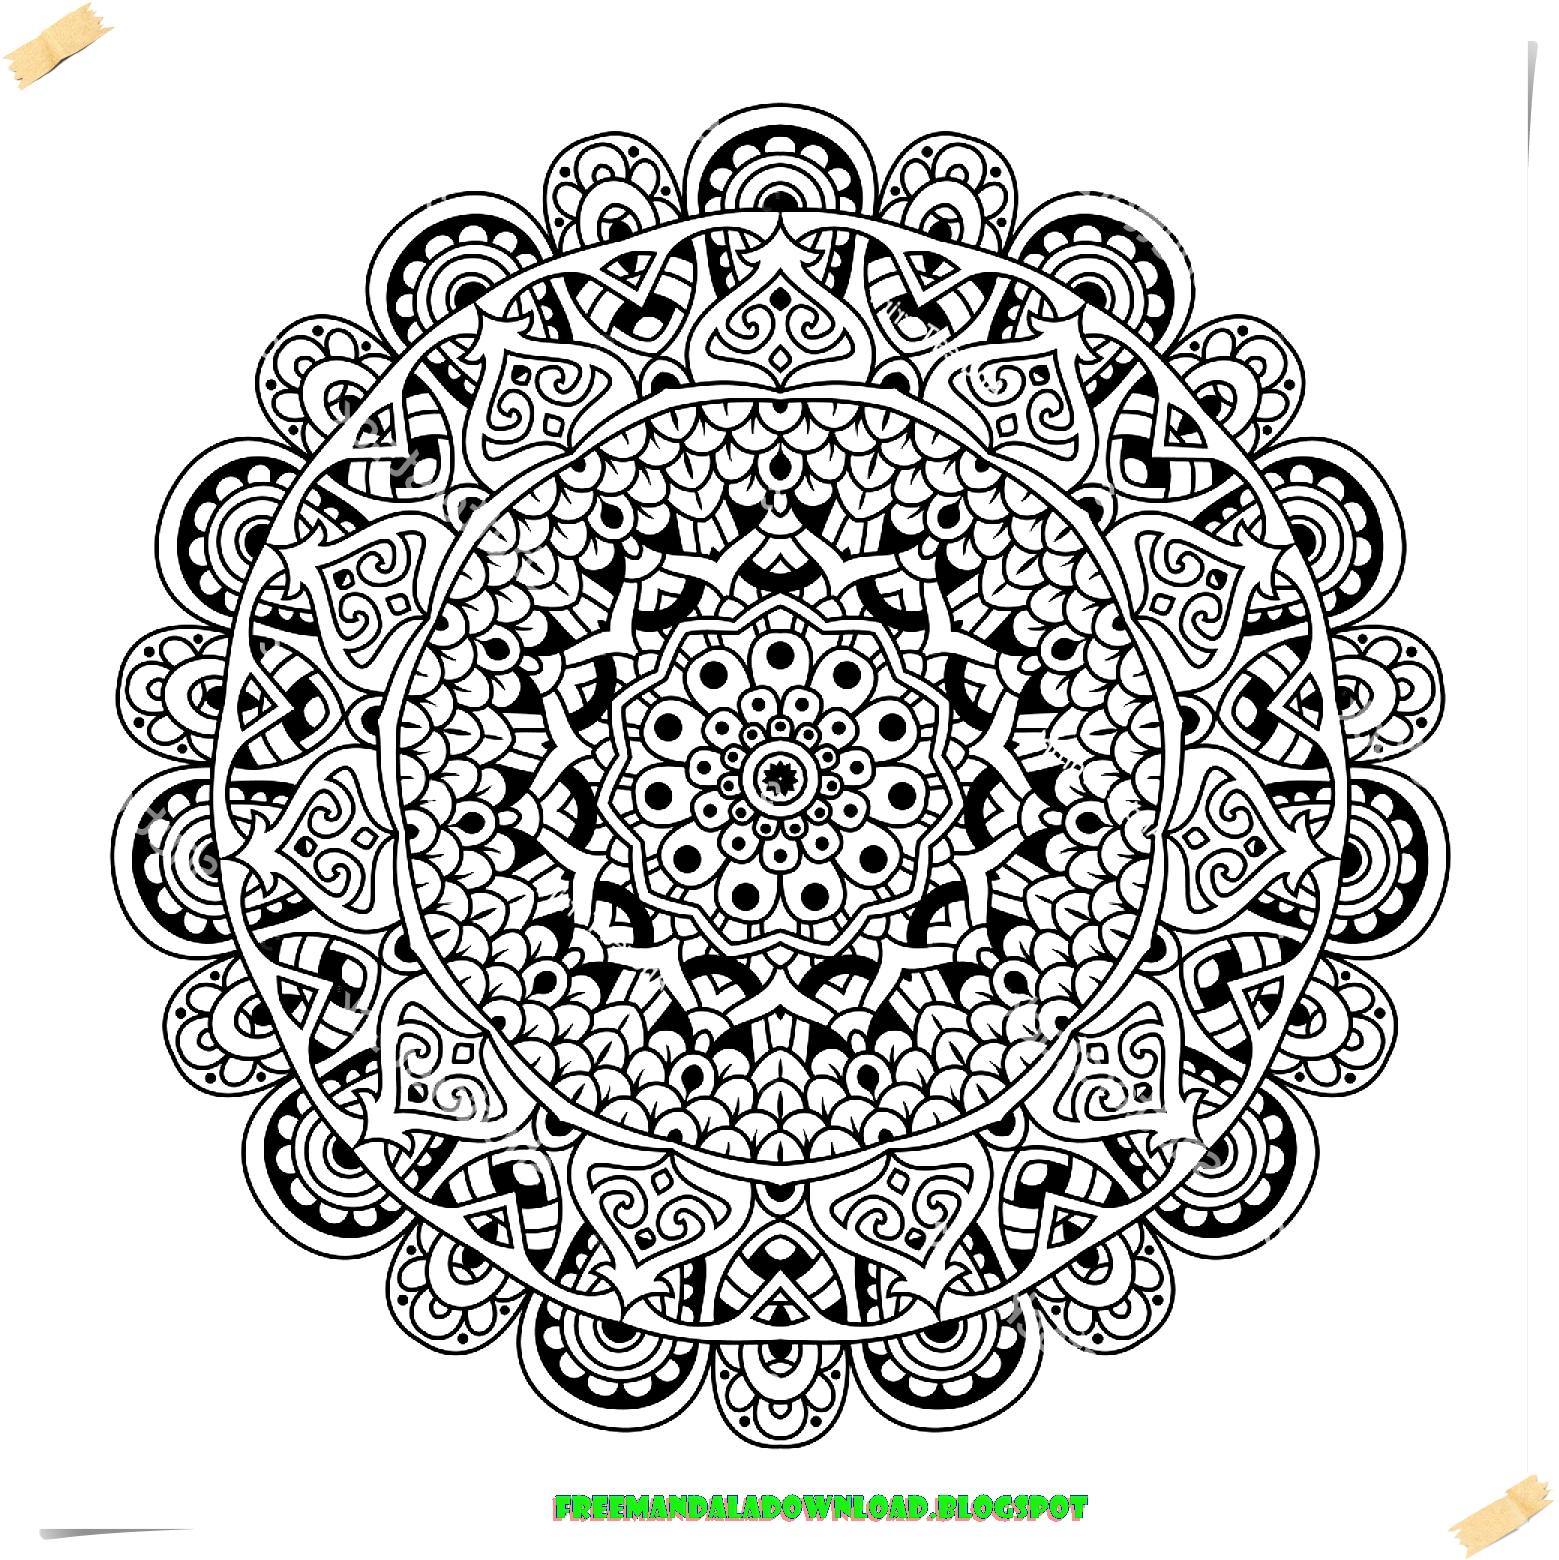 Mandala entwirft freien Vektor-Mandala designs Free Vector - Free ...